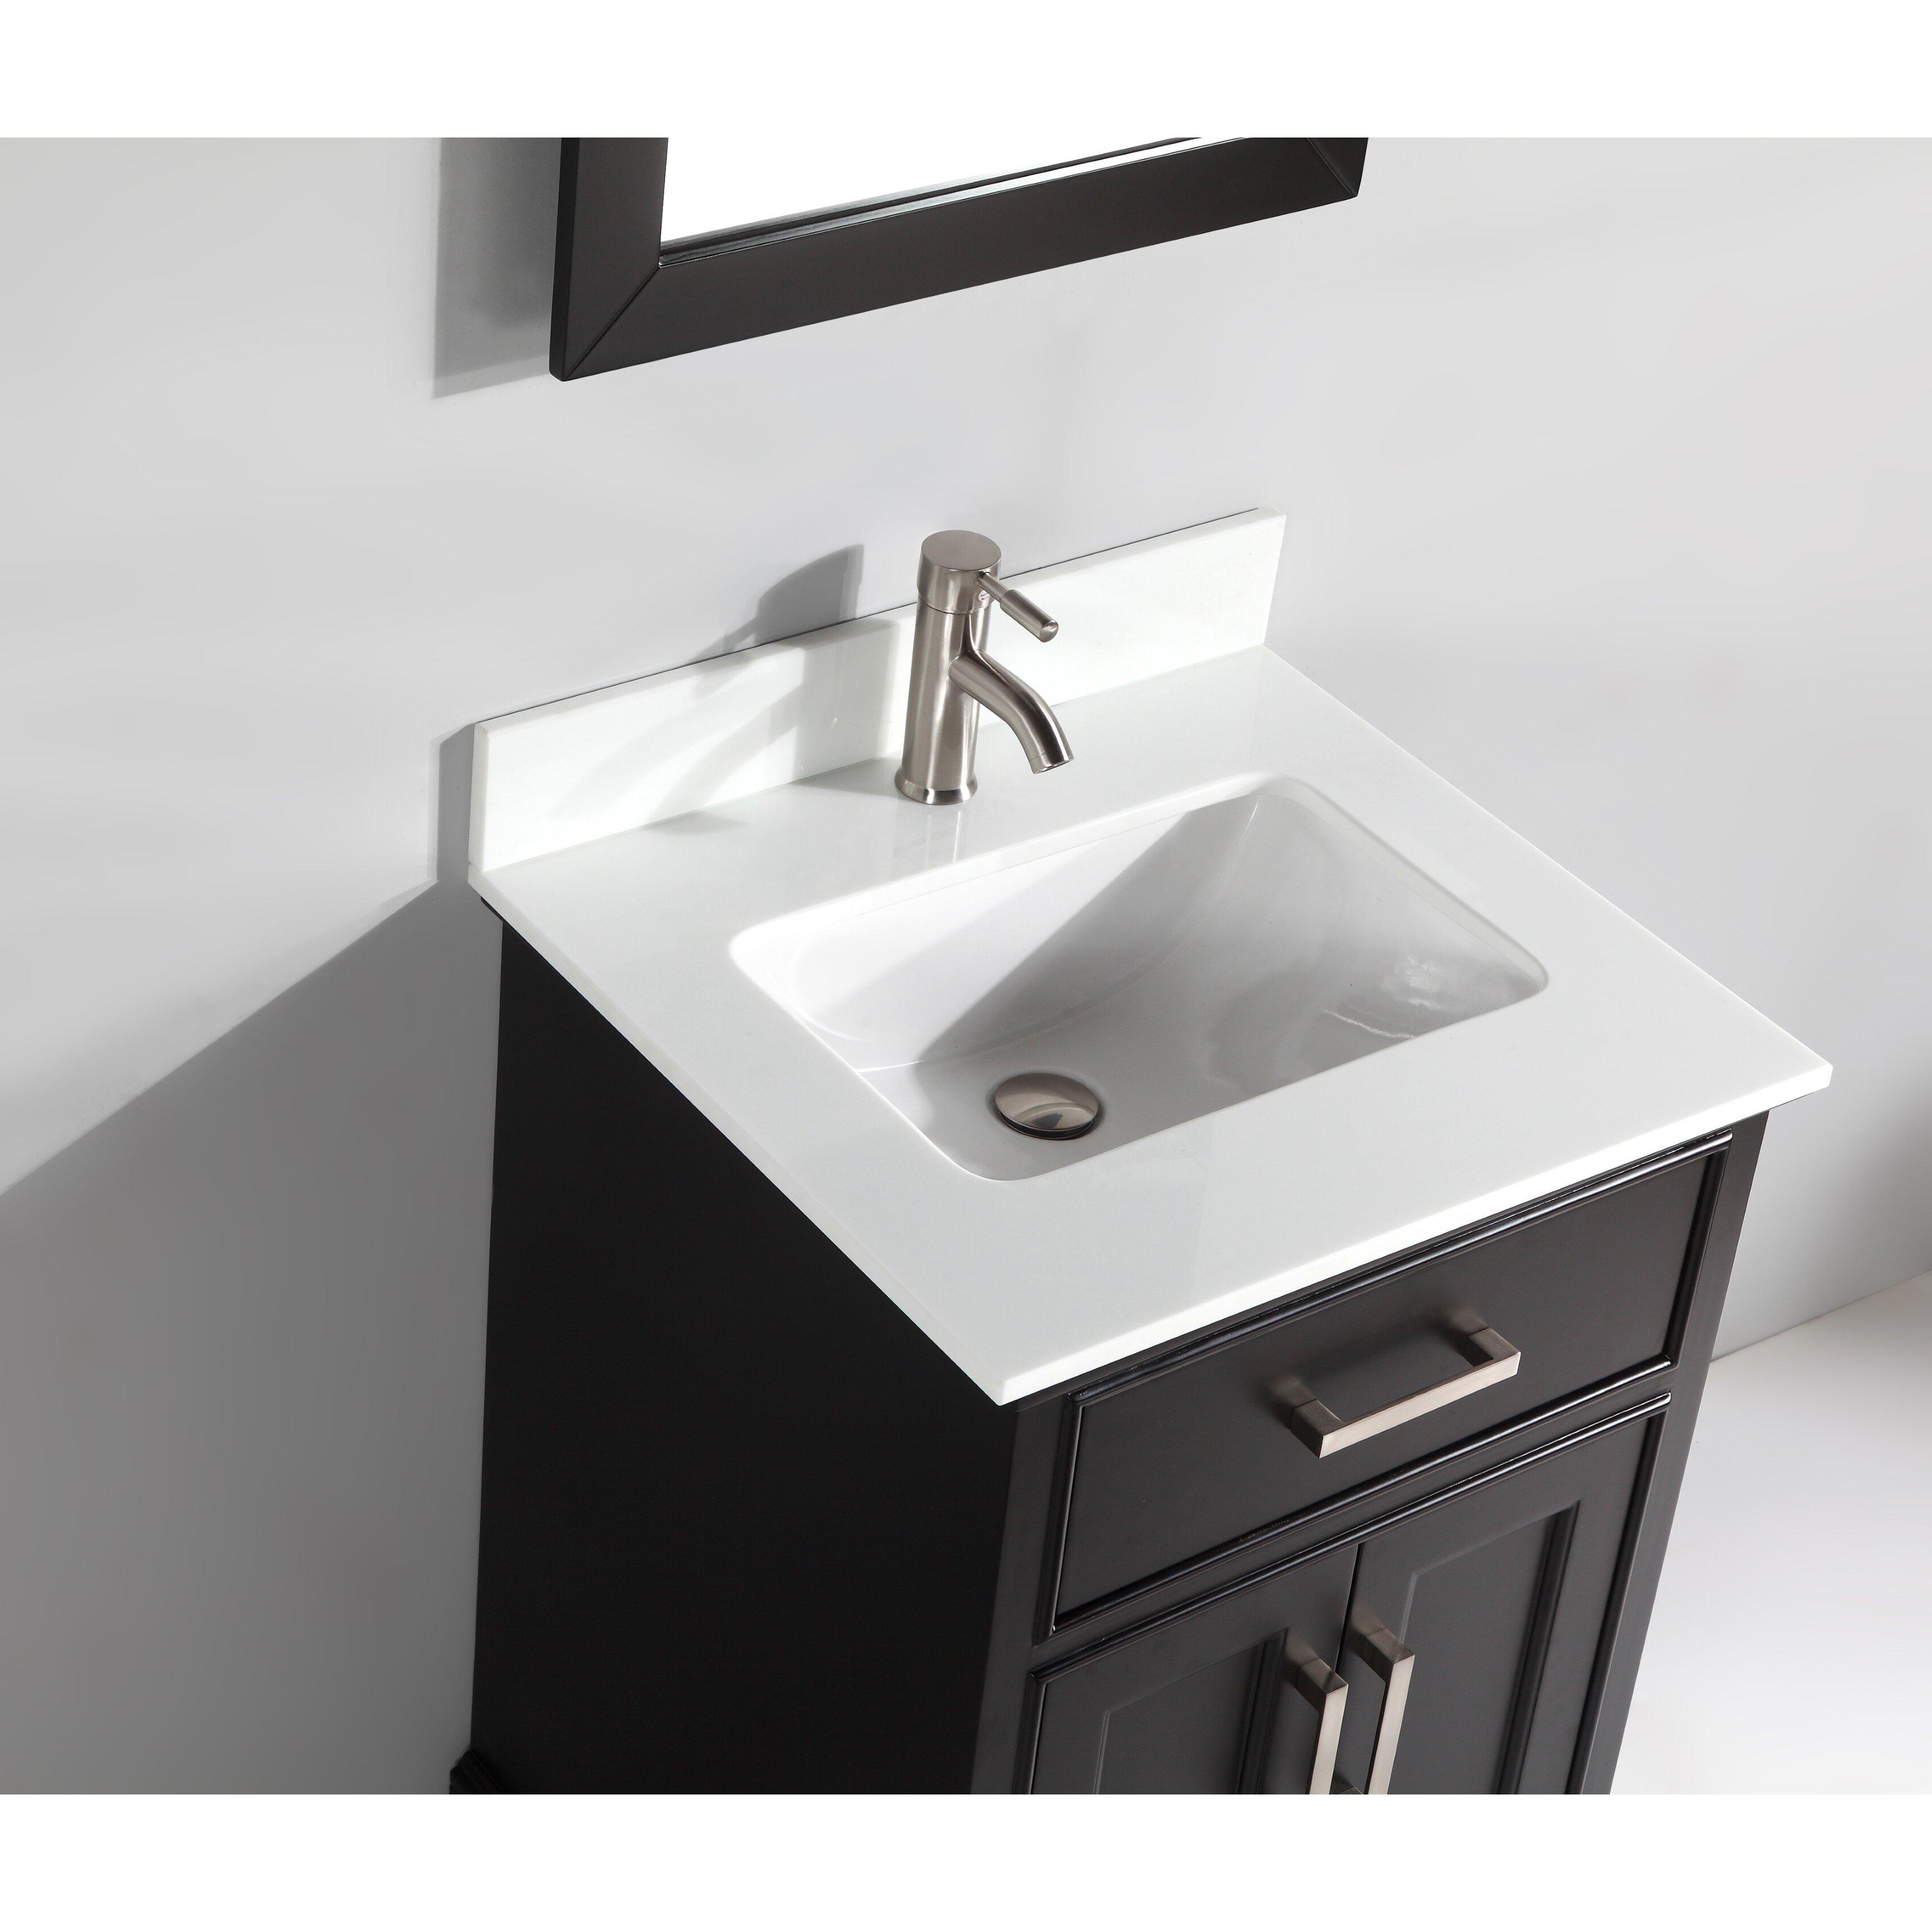 "Mirrored Bathroom Vanity Toronto: Vanity Art 24"" Single Bathroom Vanity Set With Mirror"